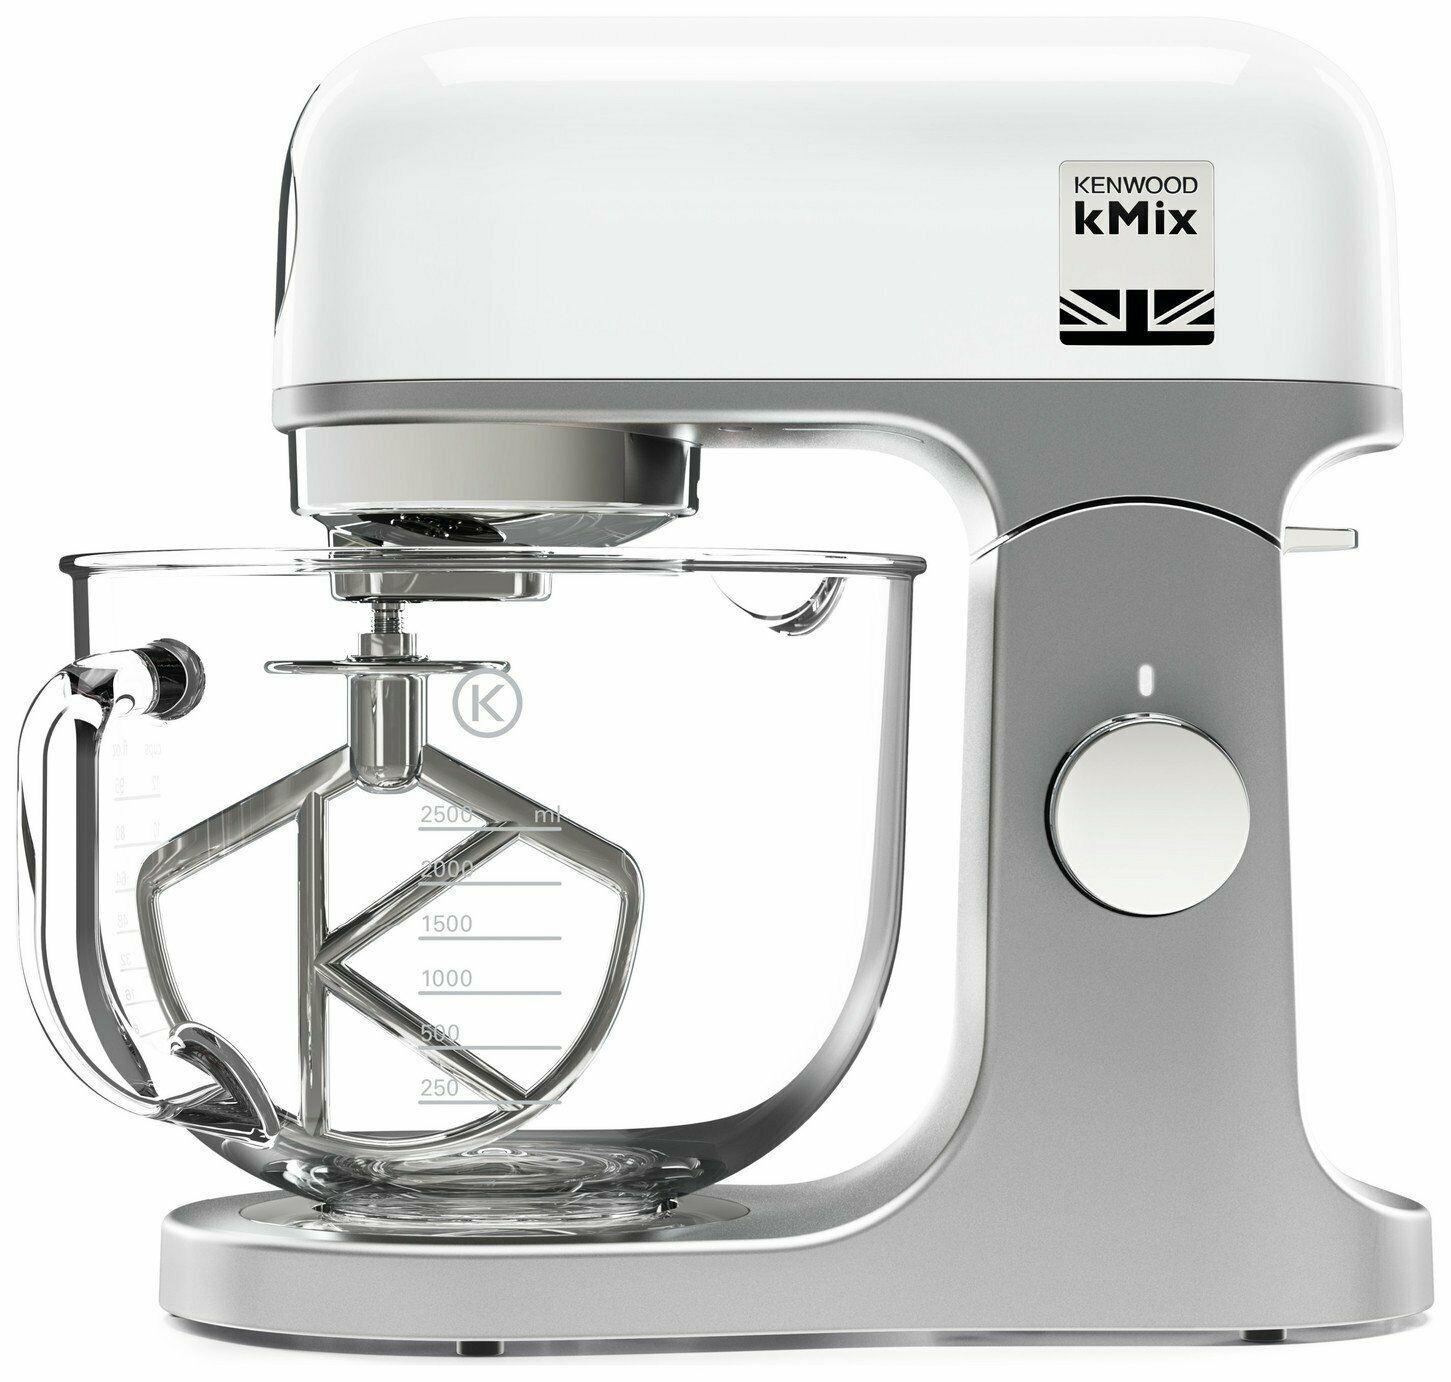 Kenwood kMix Stand Mixer 6 Speeds Pulse Control 5L 1000W - White £164.99 Argos eBay